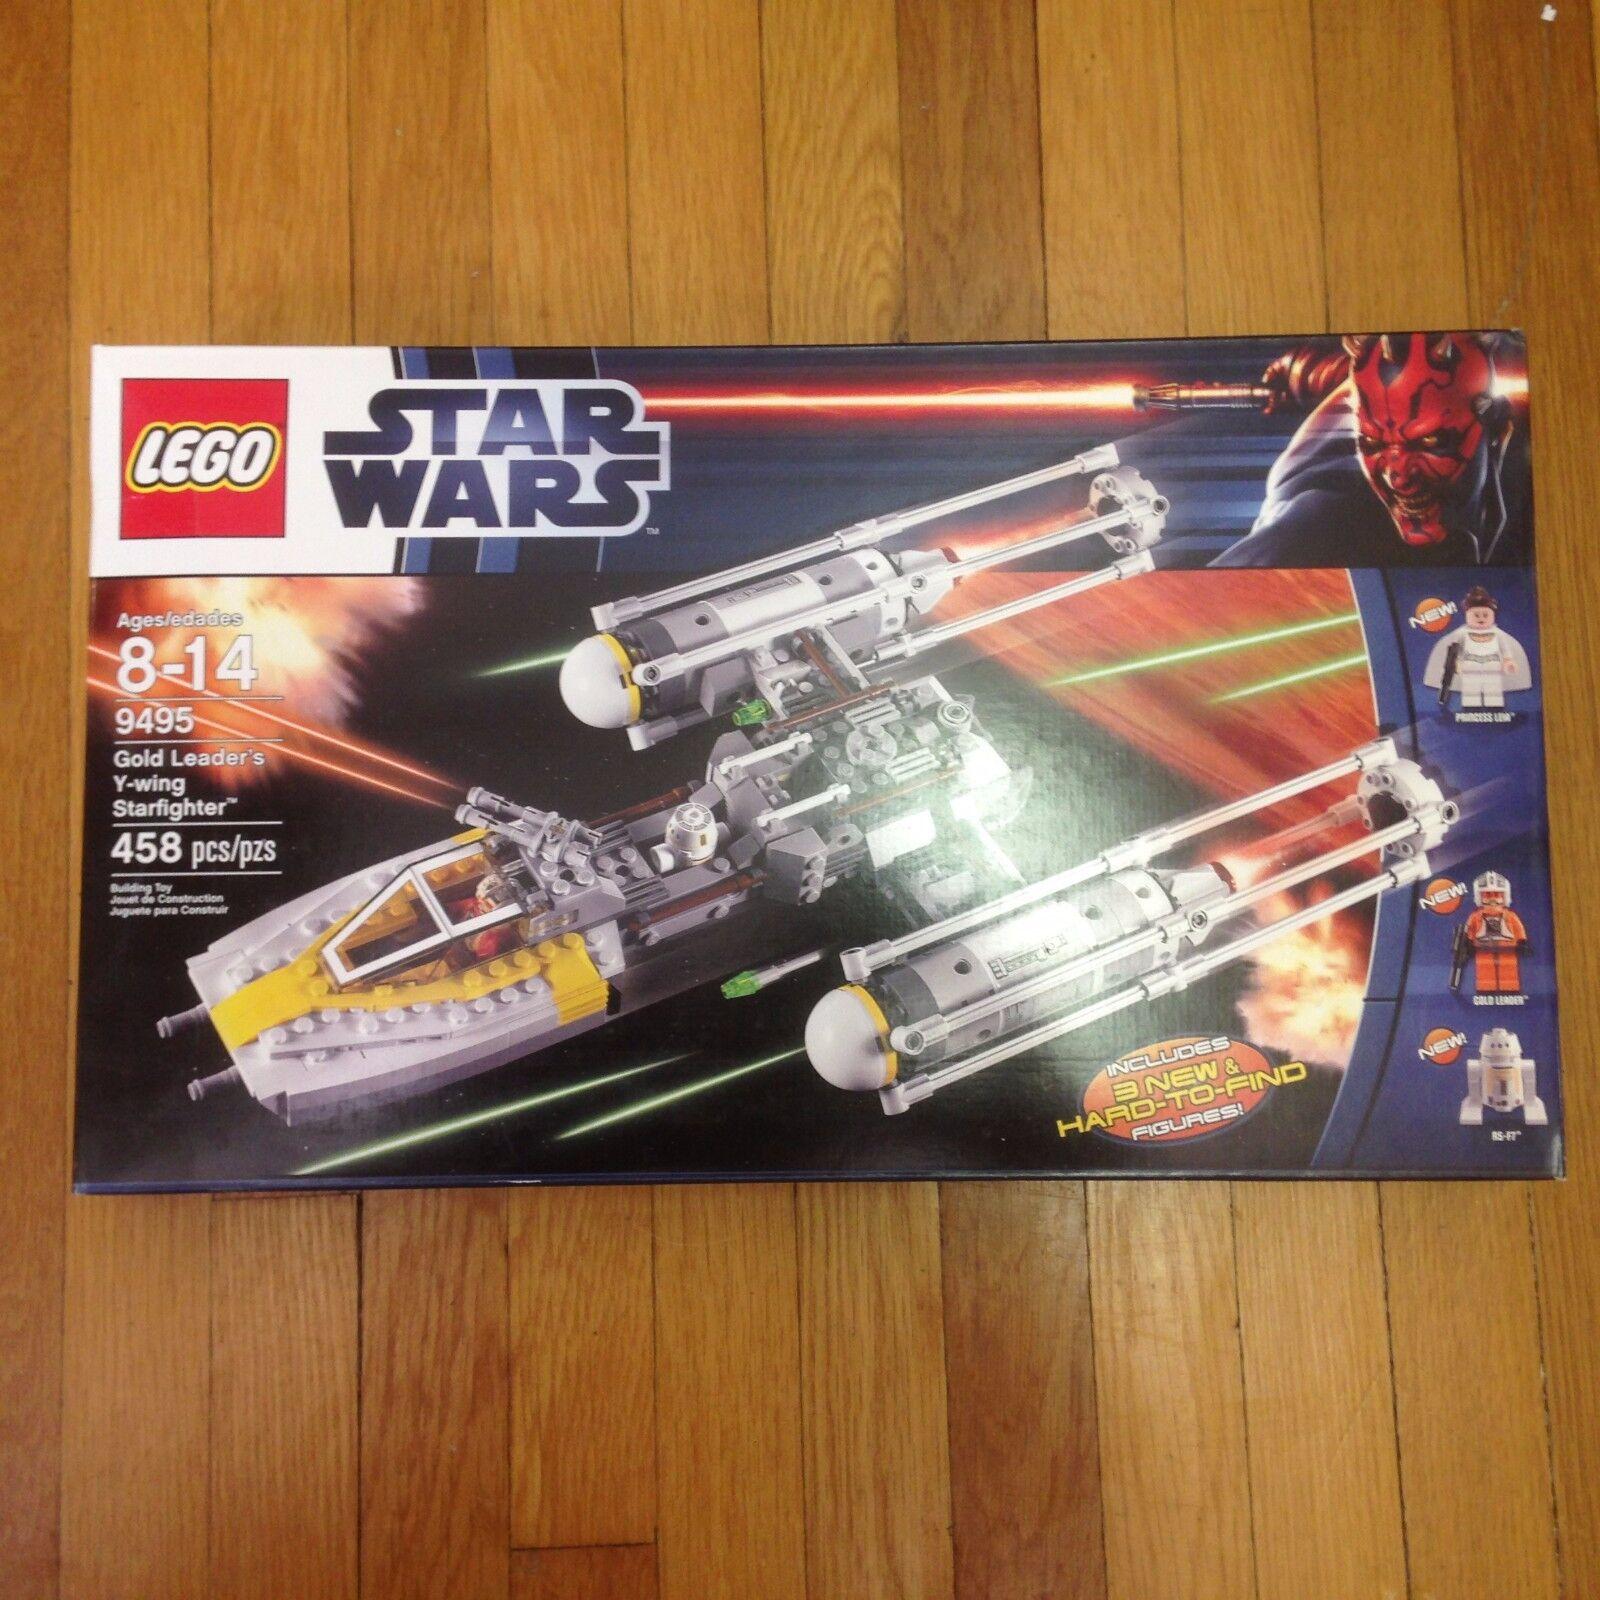 LEGO STAR STAR STAR WARS gold LEADER'S Y-WING STARFIGHTER 9495 908380